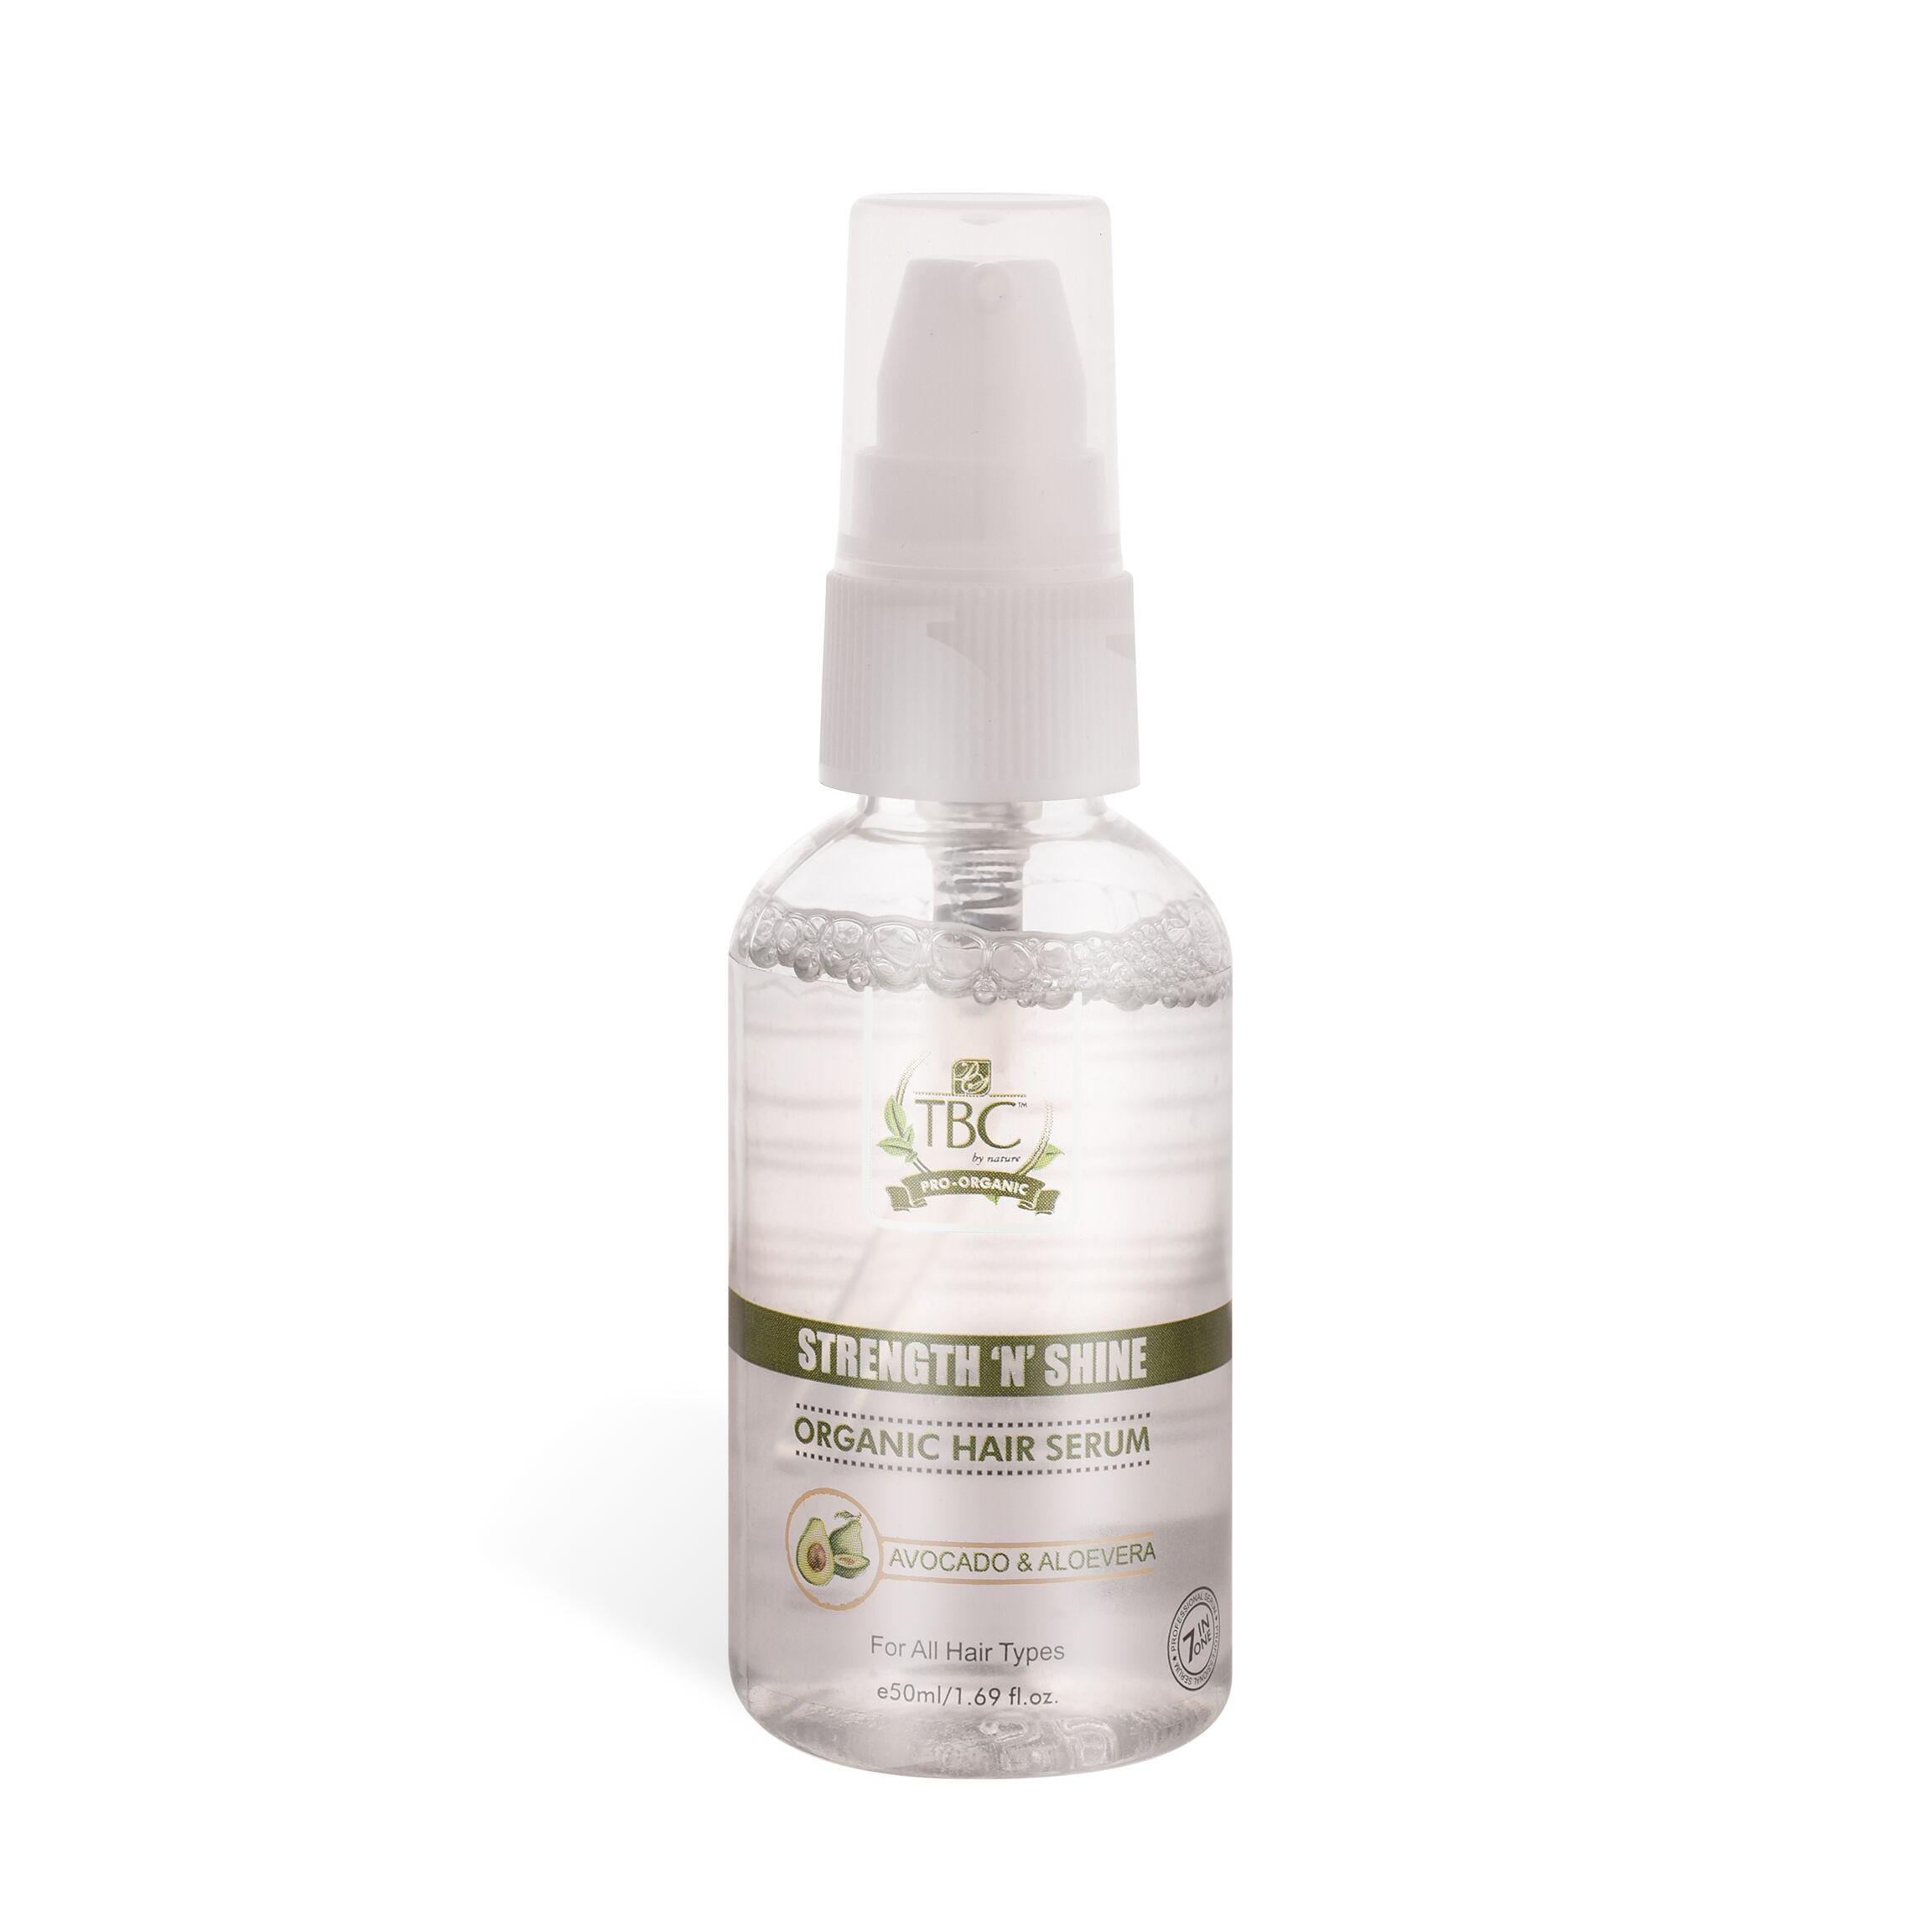 TBC Pro Strength N Shine Organic Hair Serum 50ml